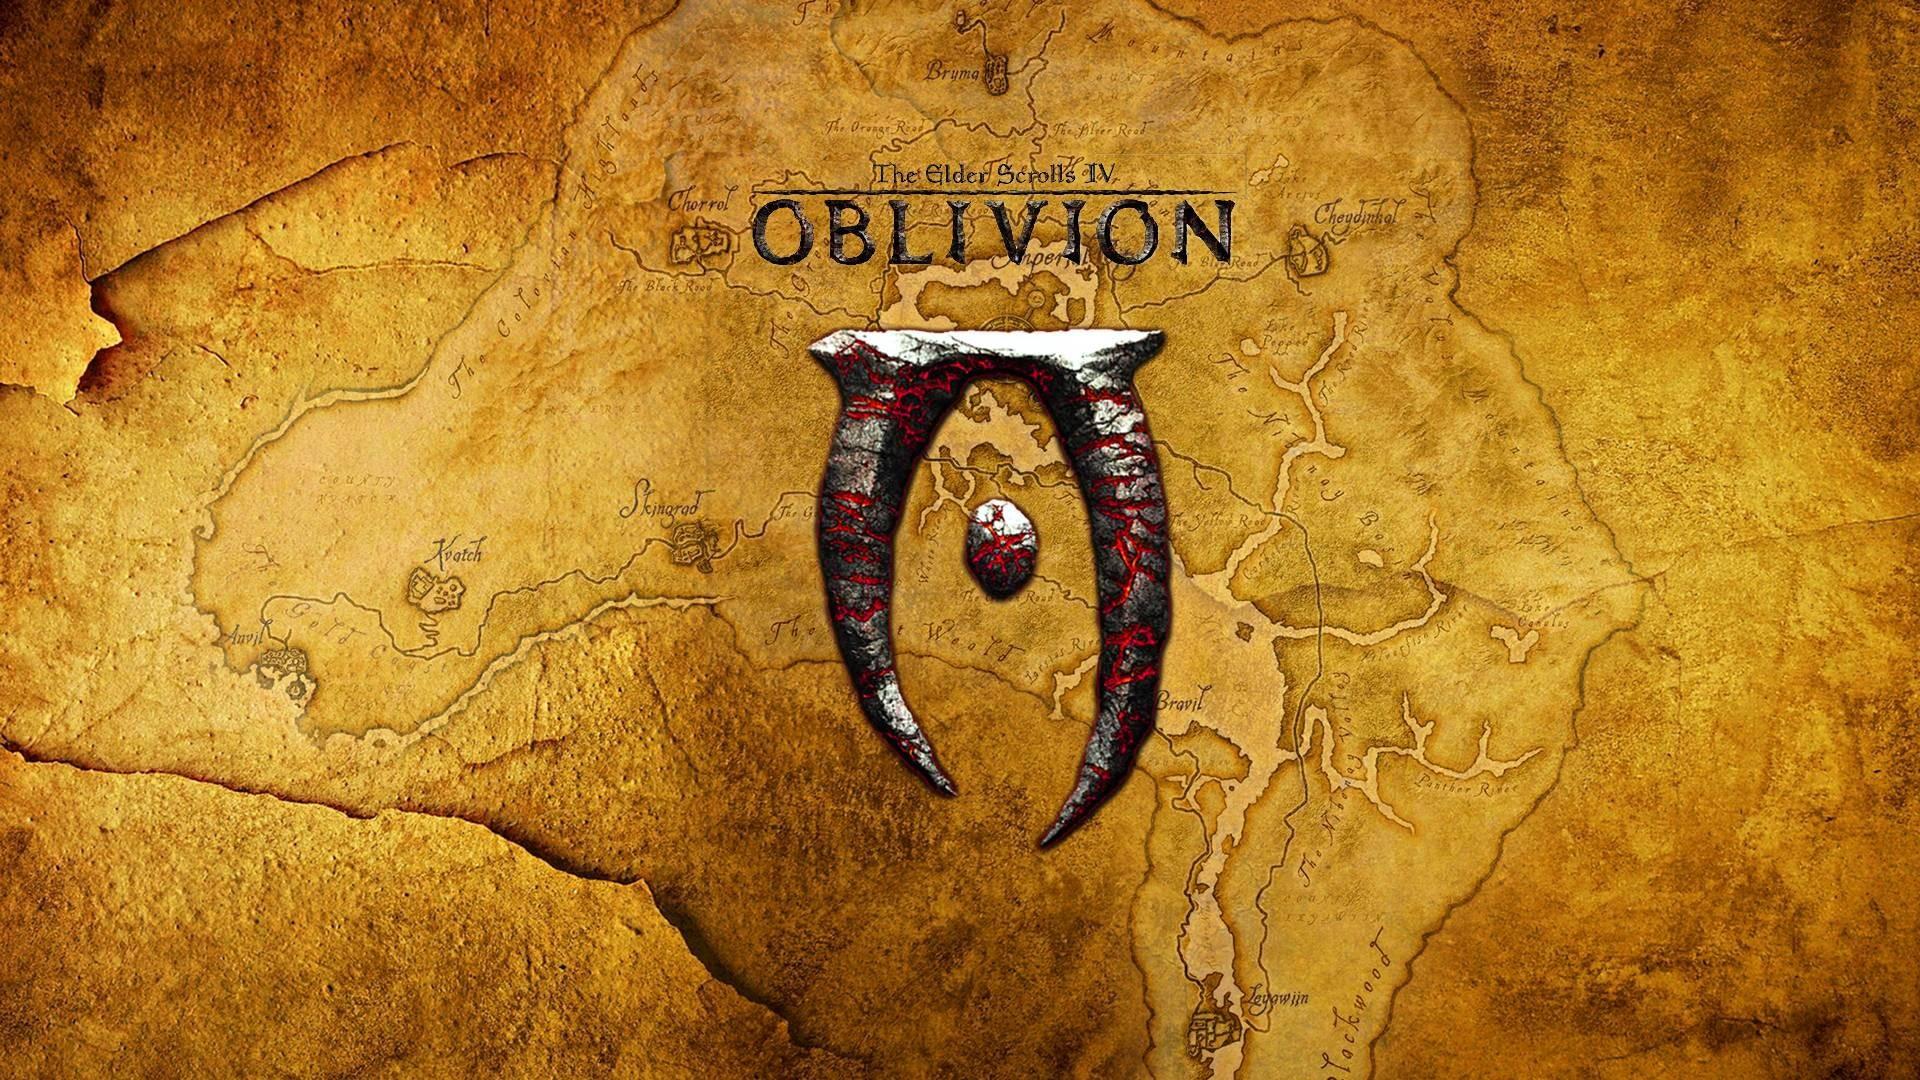 The Elder Scrolls IV: Oblivion clipart #15, Download drawings